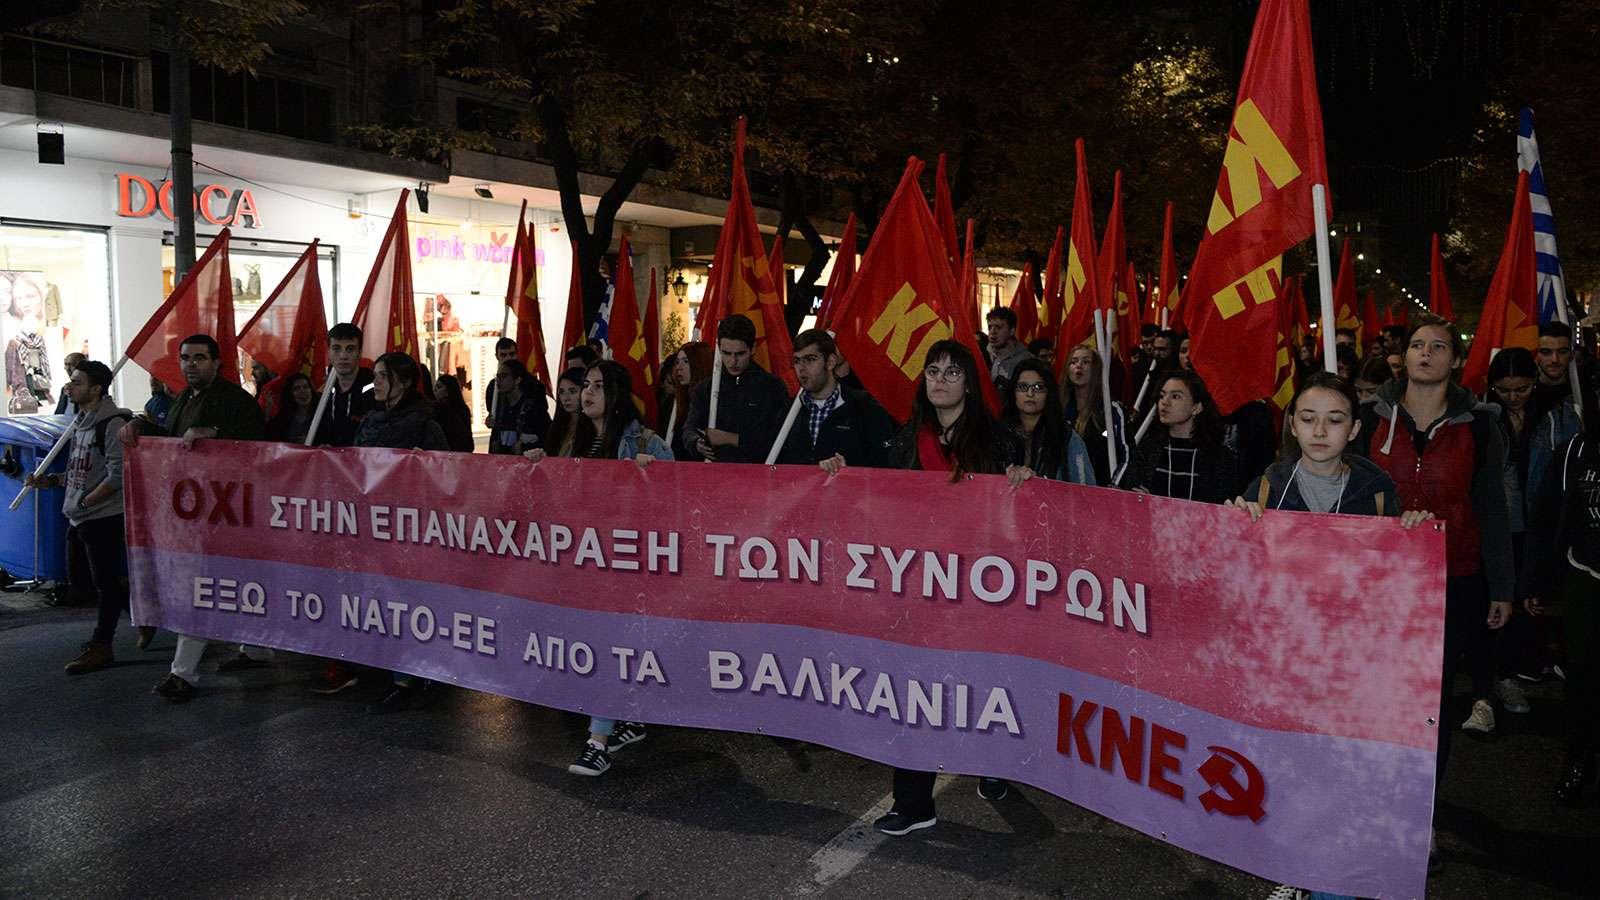 thessaloniki kke3